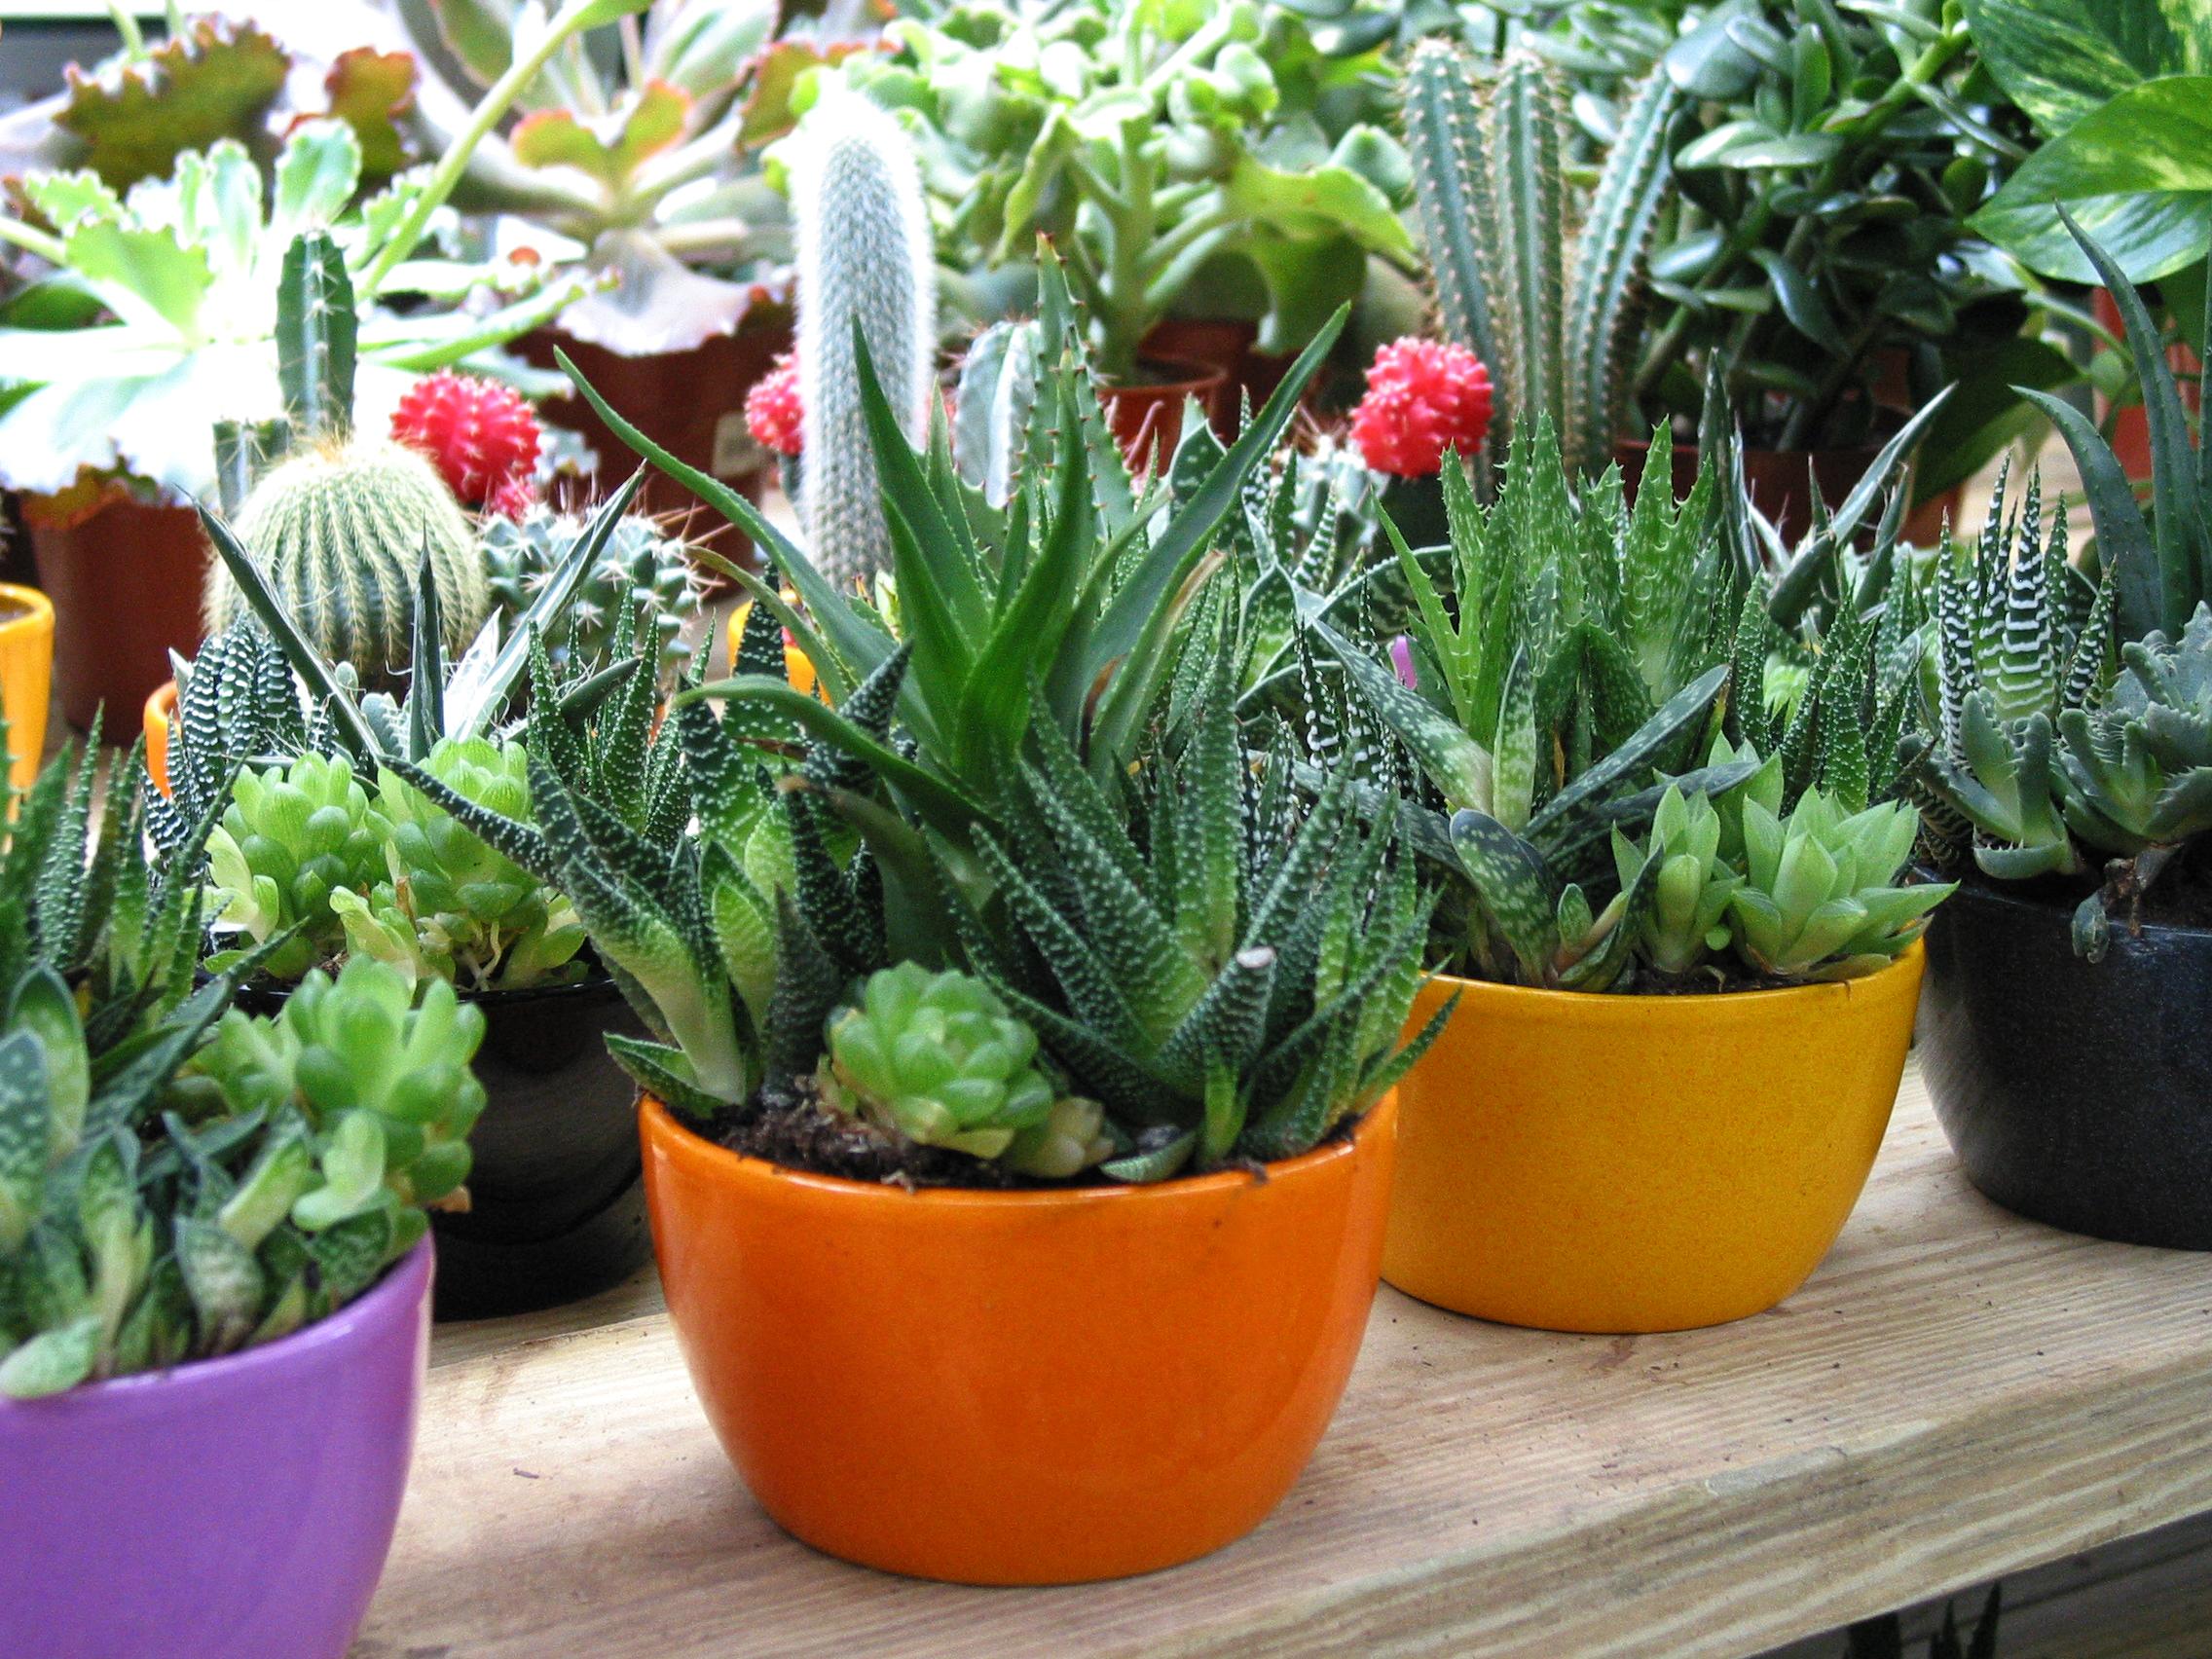 Cactus Plants Free Stock Photo Image Cactus Picture